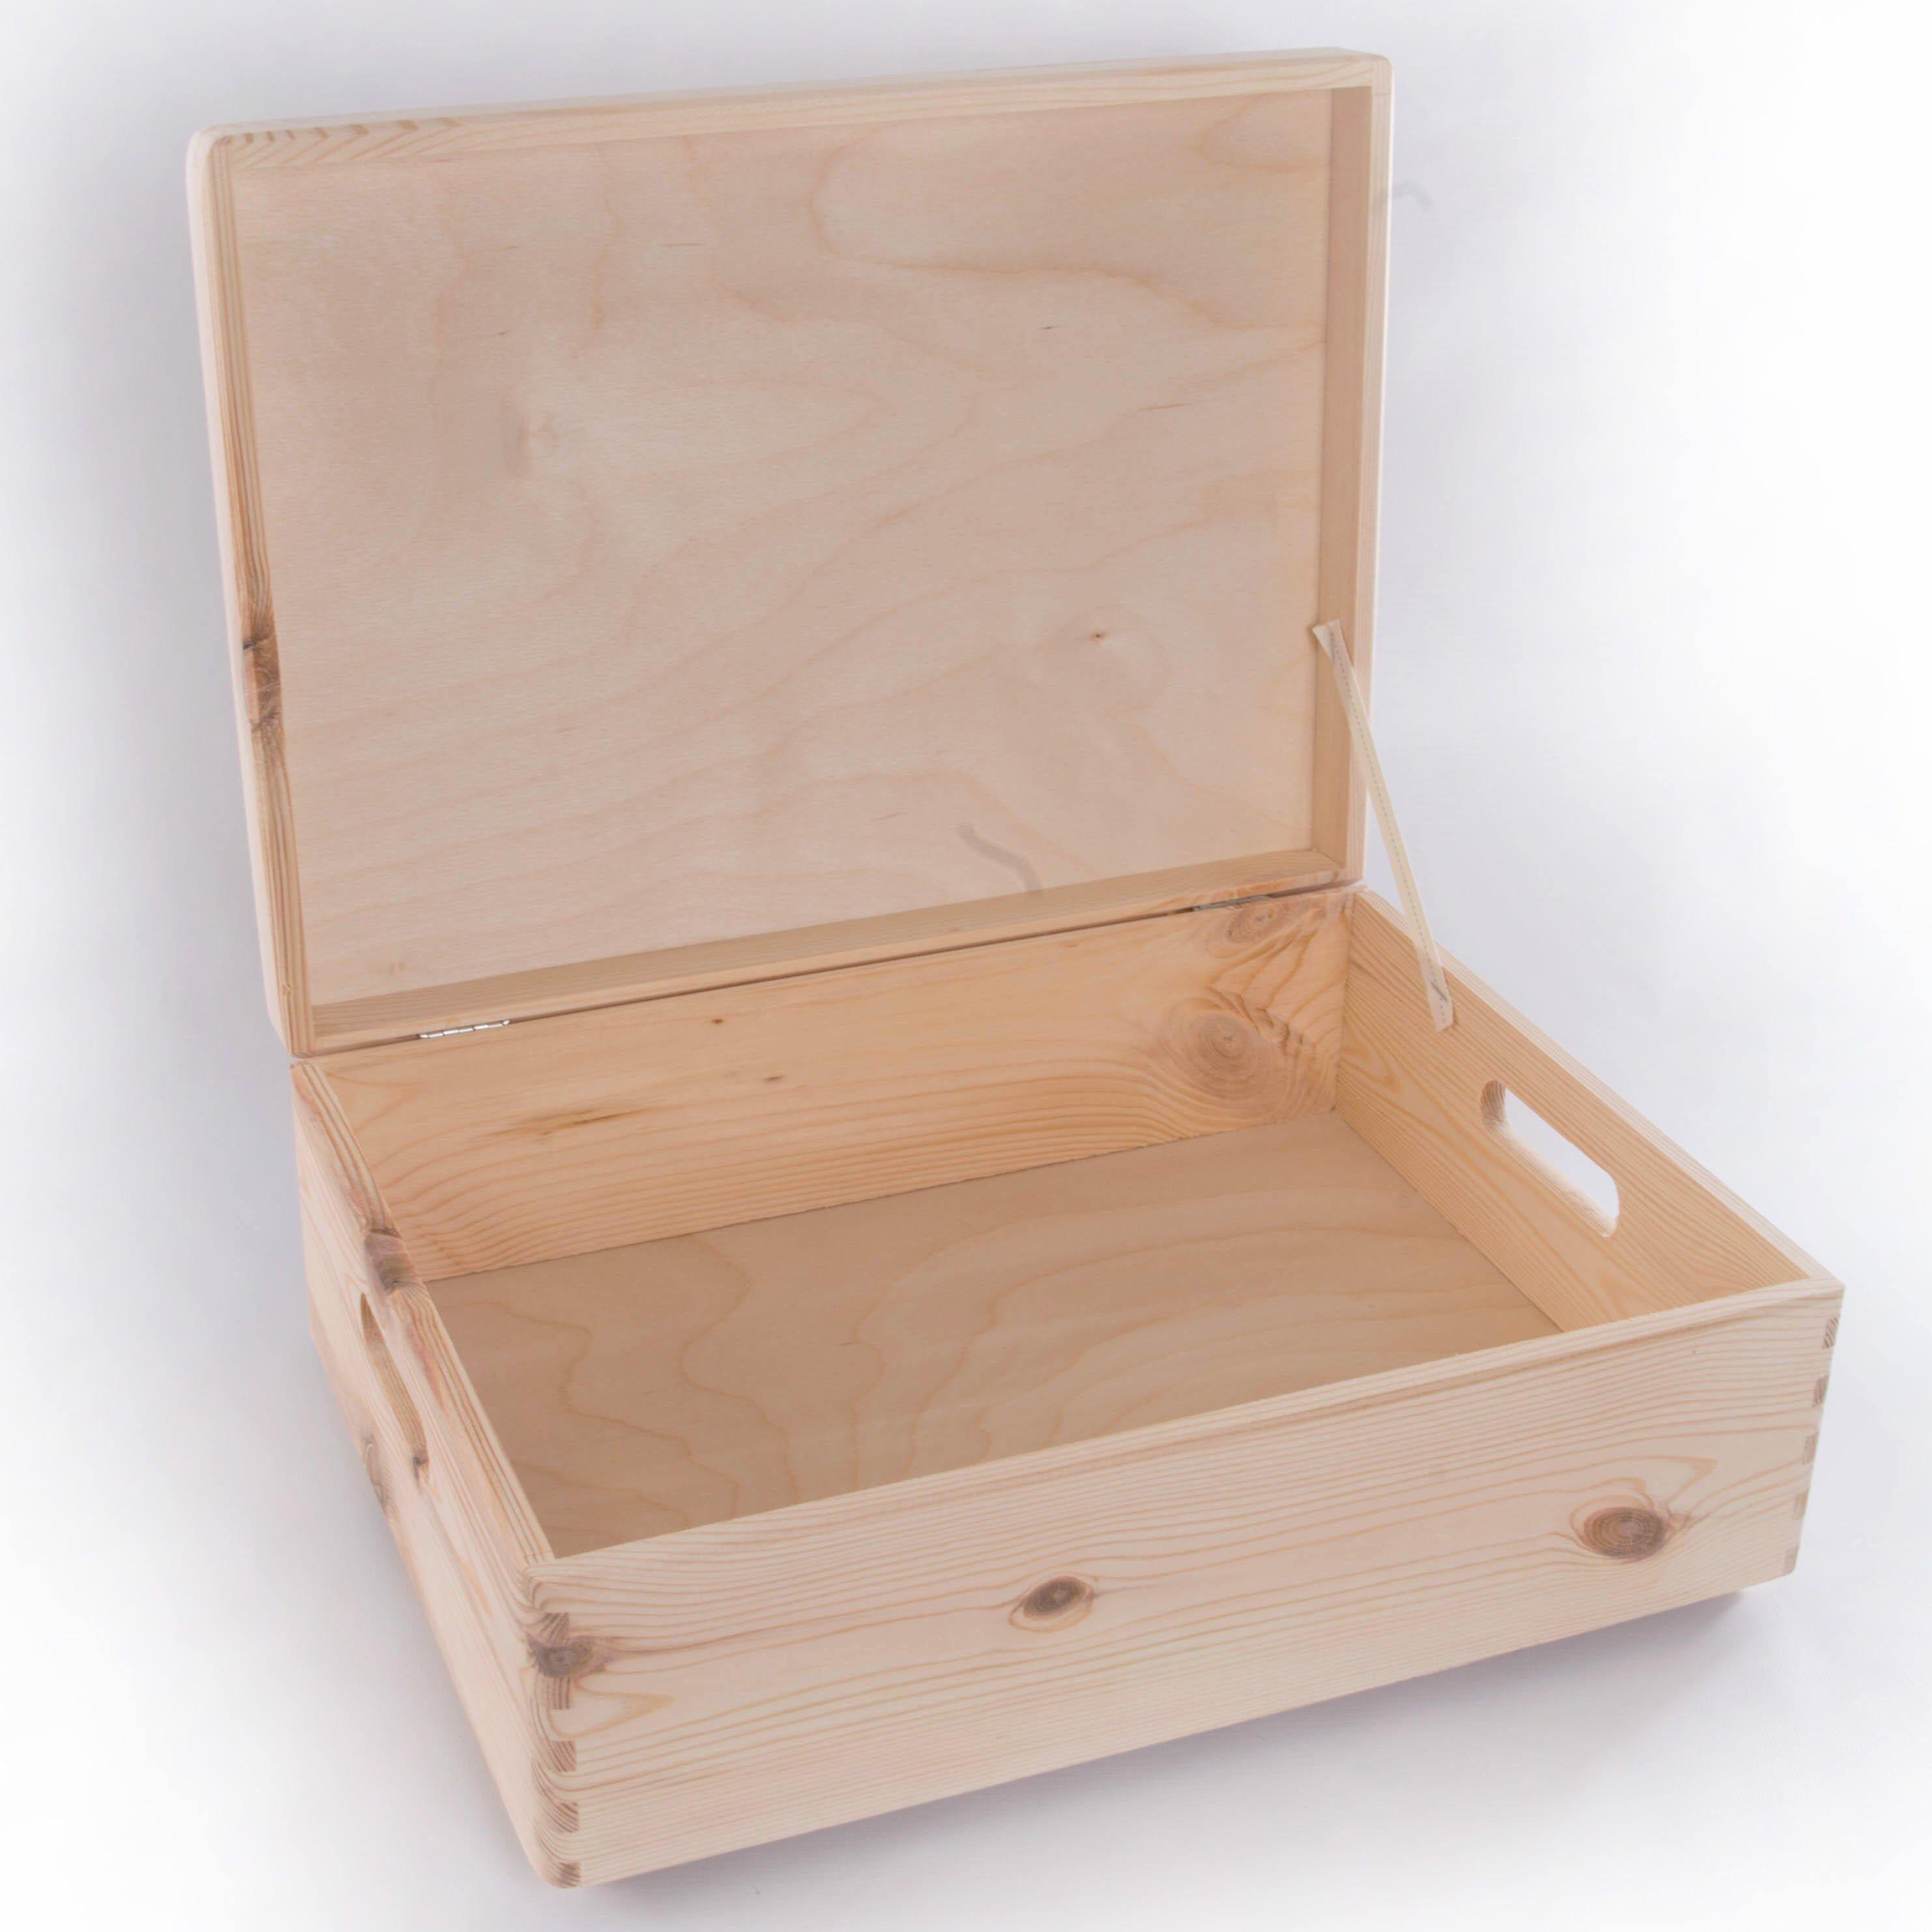 Large Wooden Storage Box Plain Wood Box With Lid Crate Etsy Wooden Storage Boxes Wooden Storage Storage Boxes With Lids